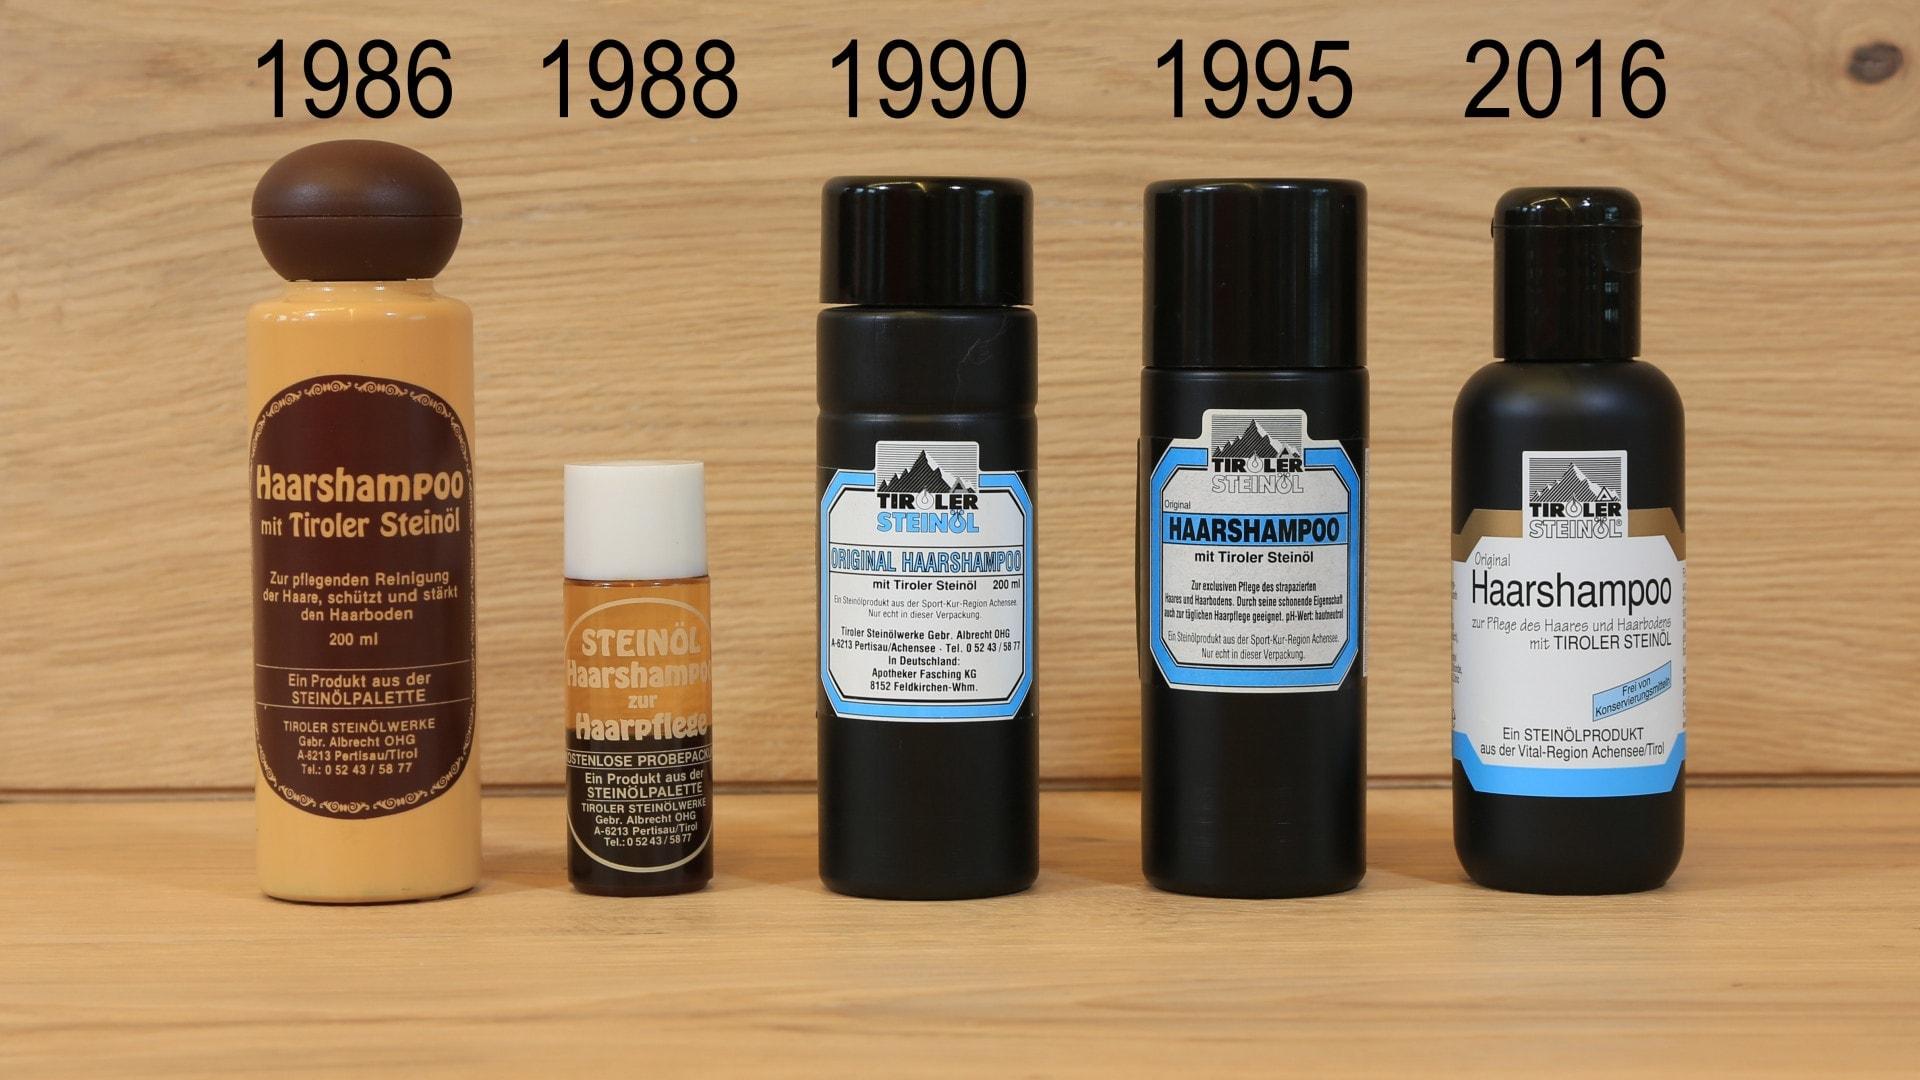 Haarshampoo 1986 bis 2016